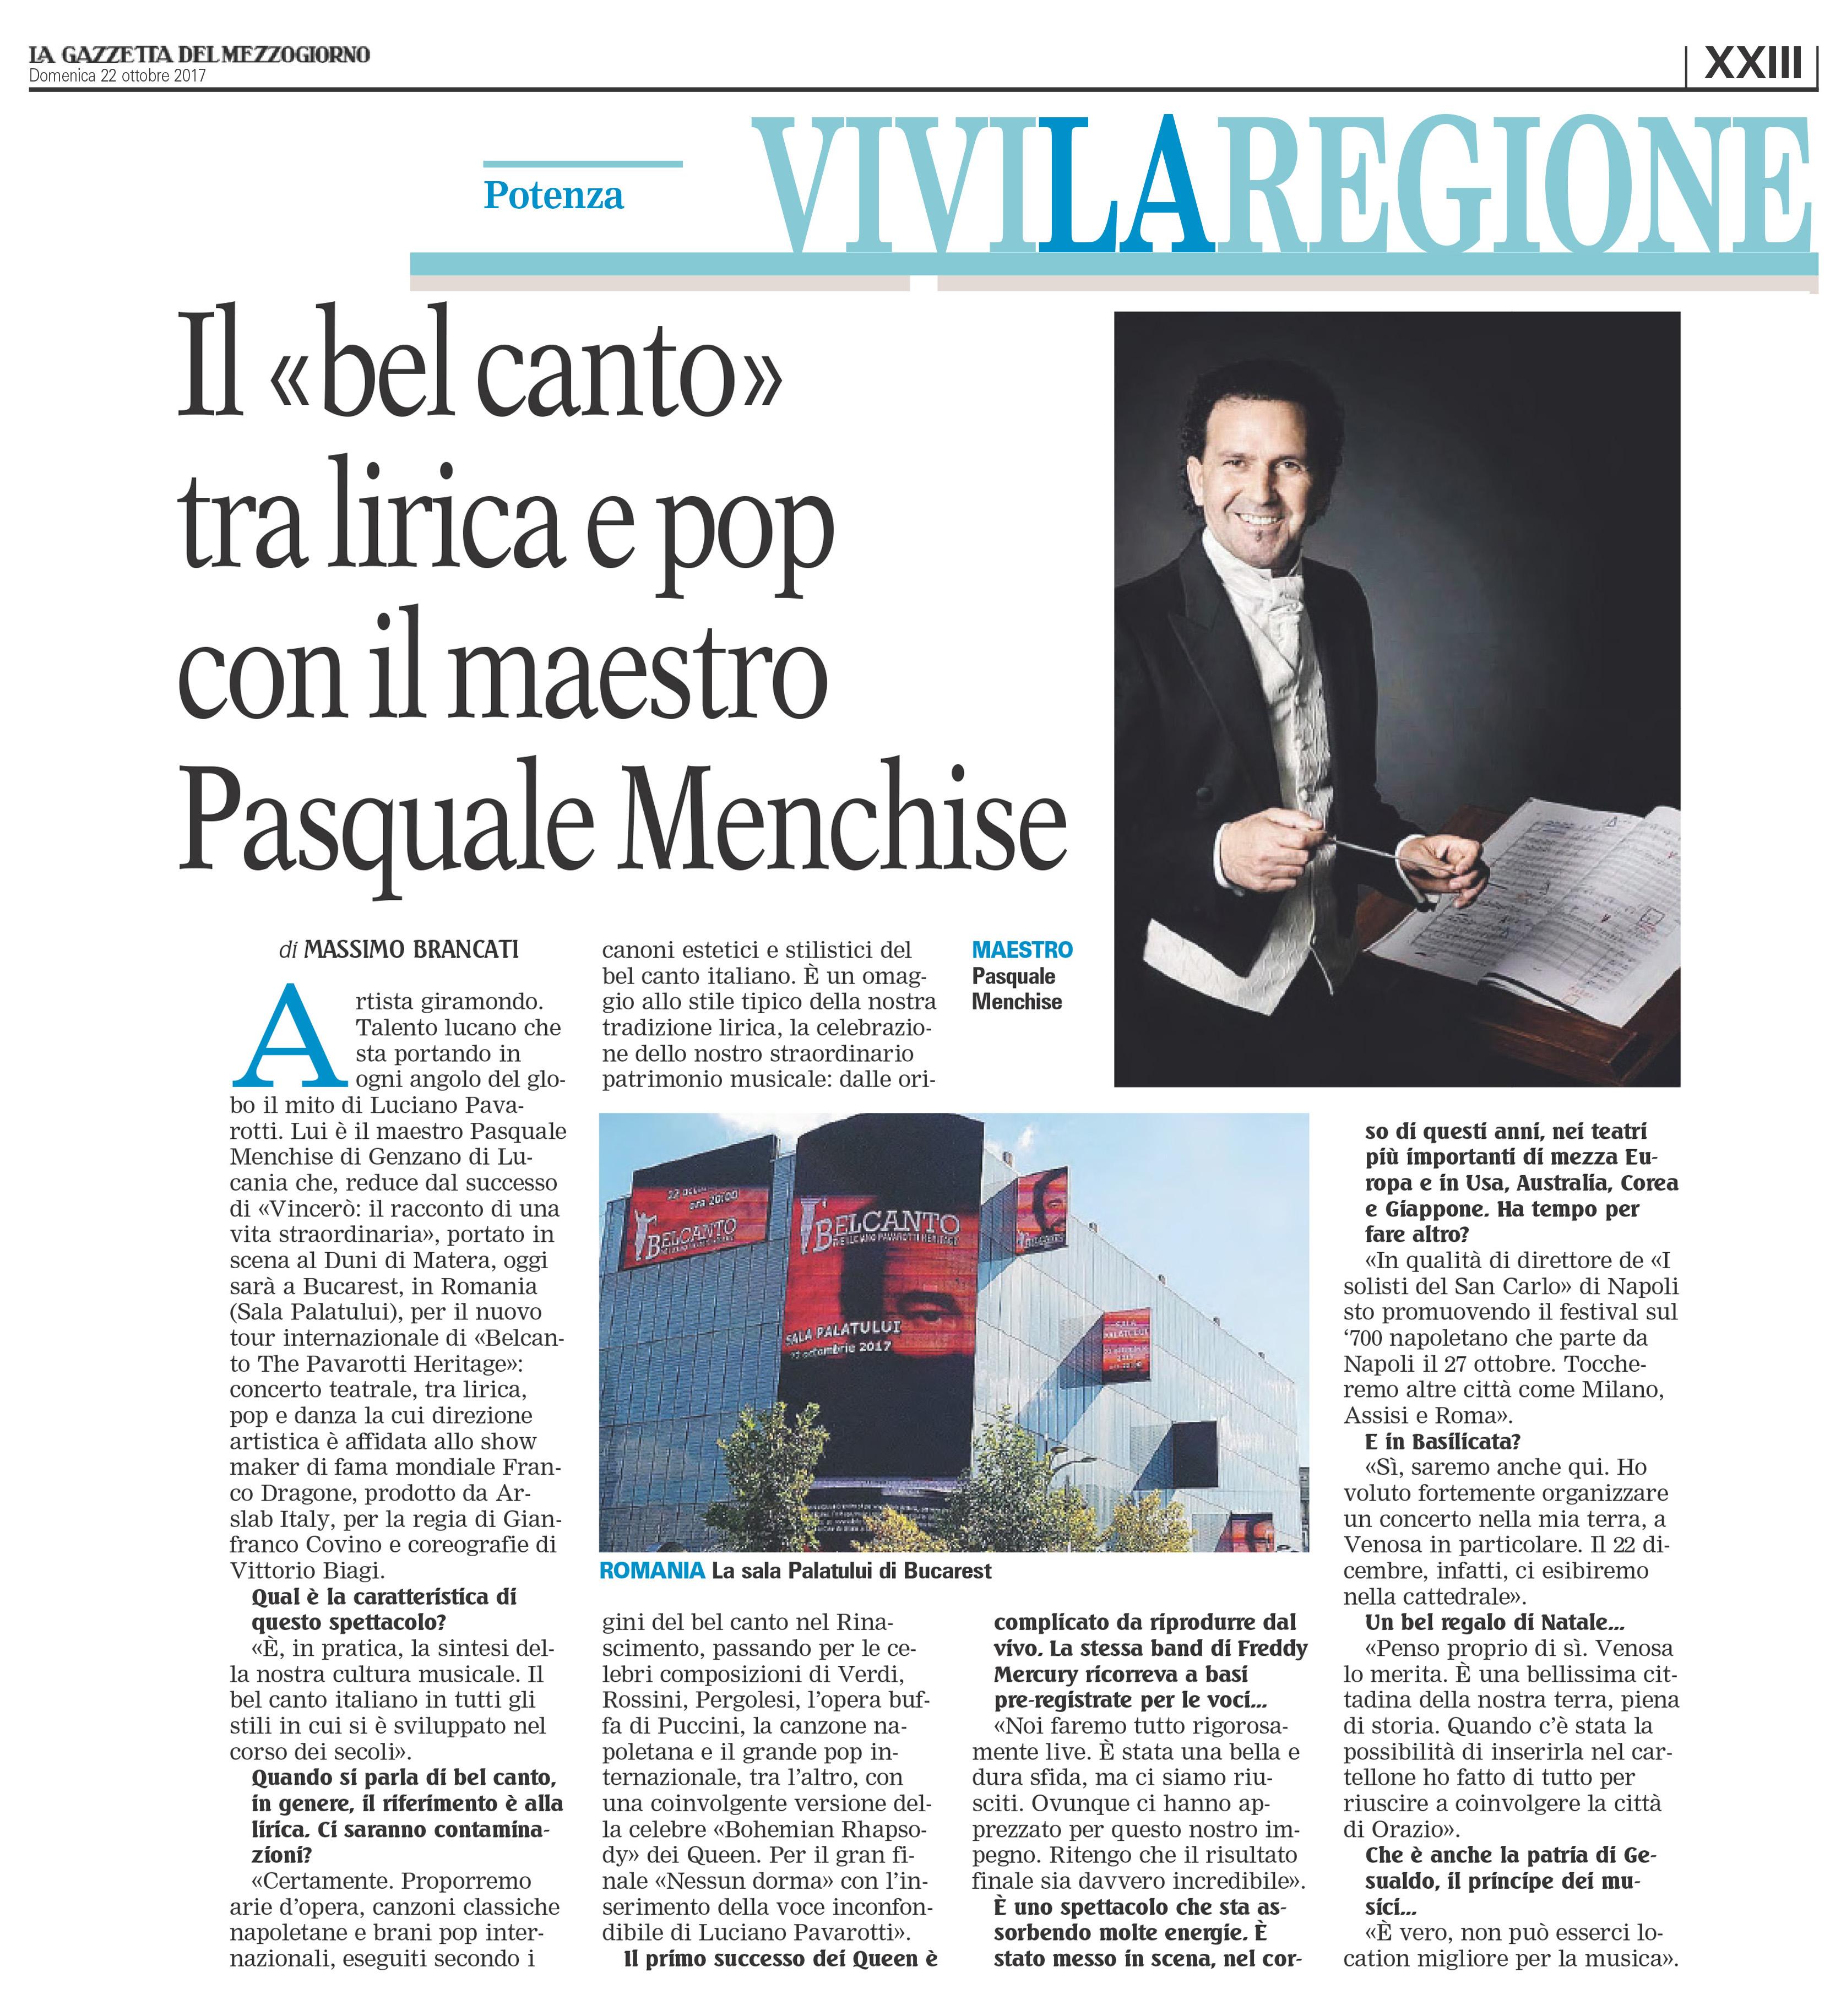 La Gazzetta_22 ottobre 2017